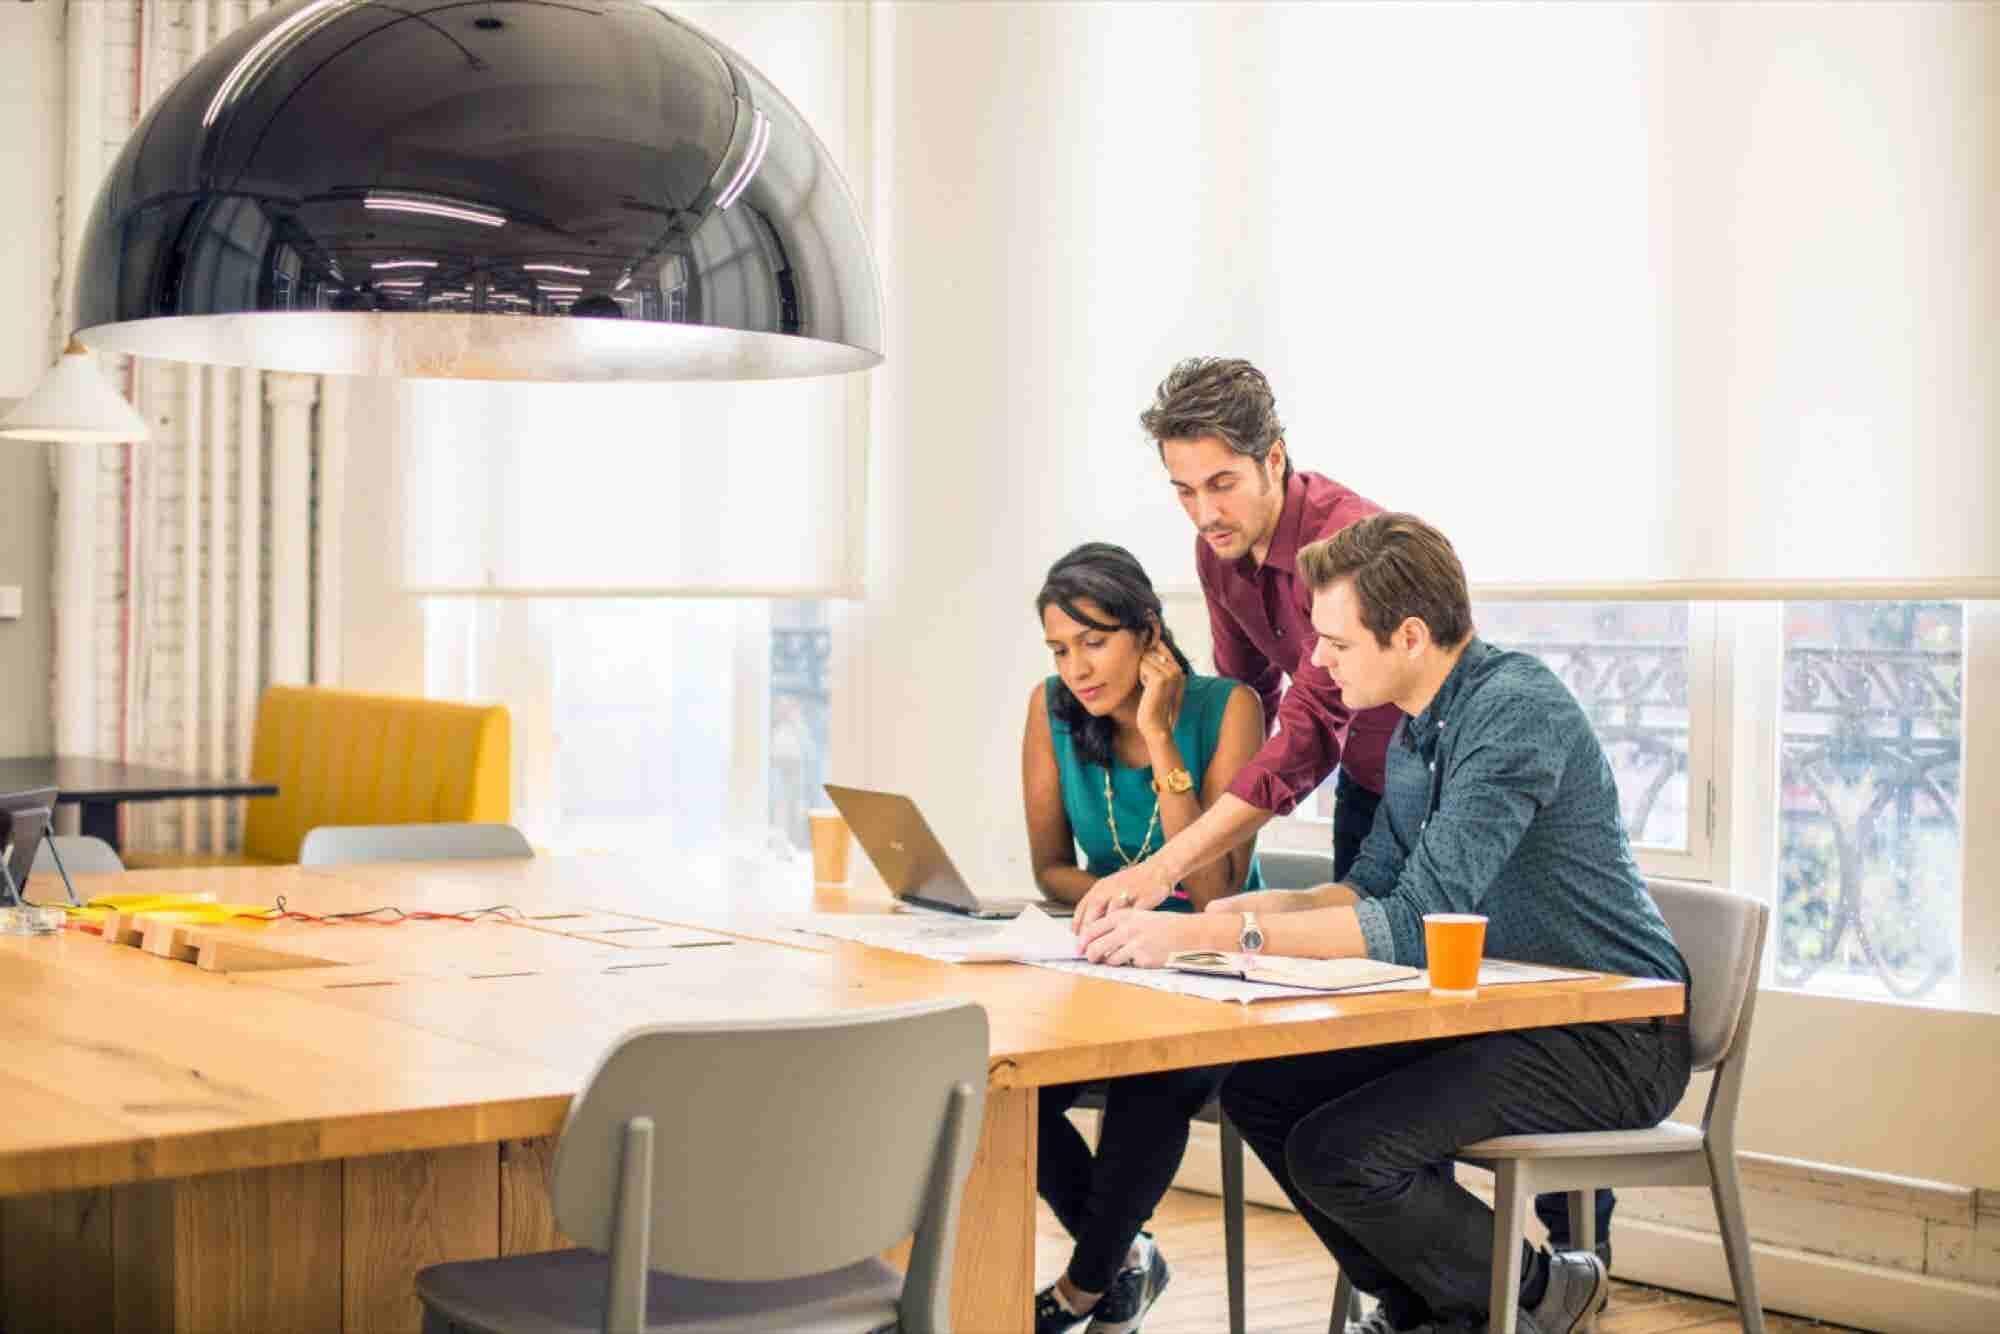 Is Management Bloat Inevitable When Companies Grow?